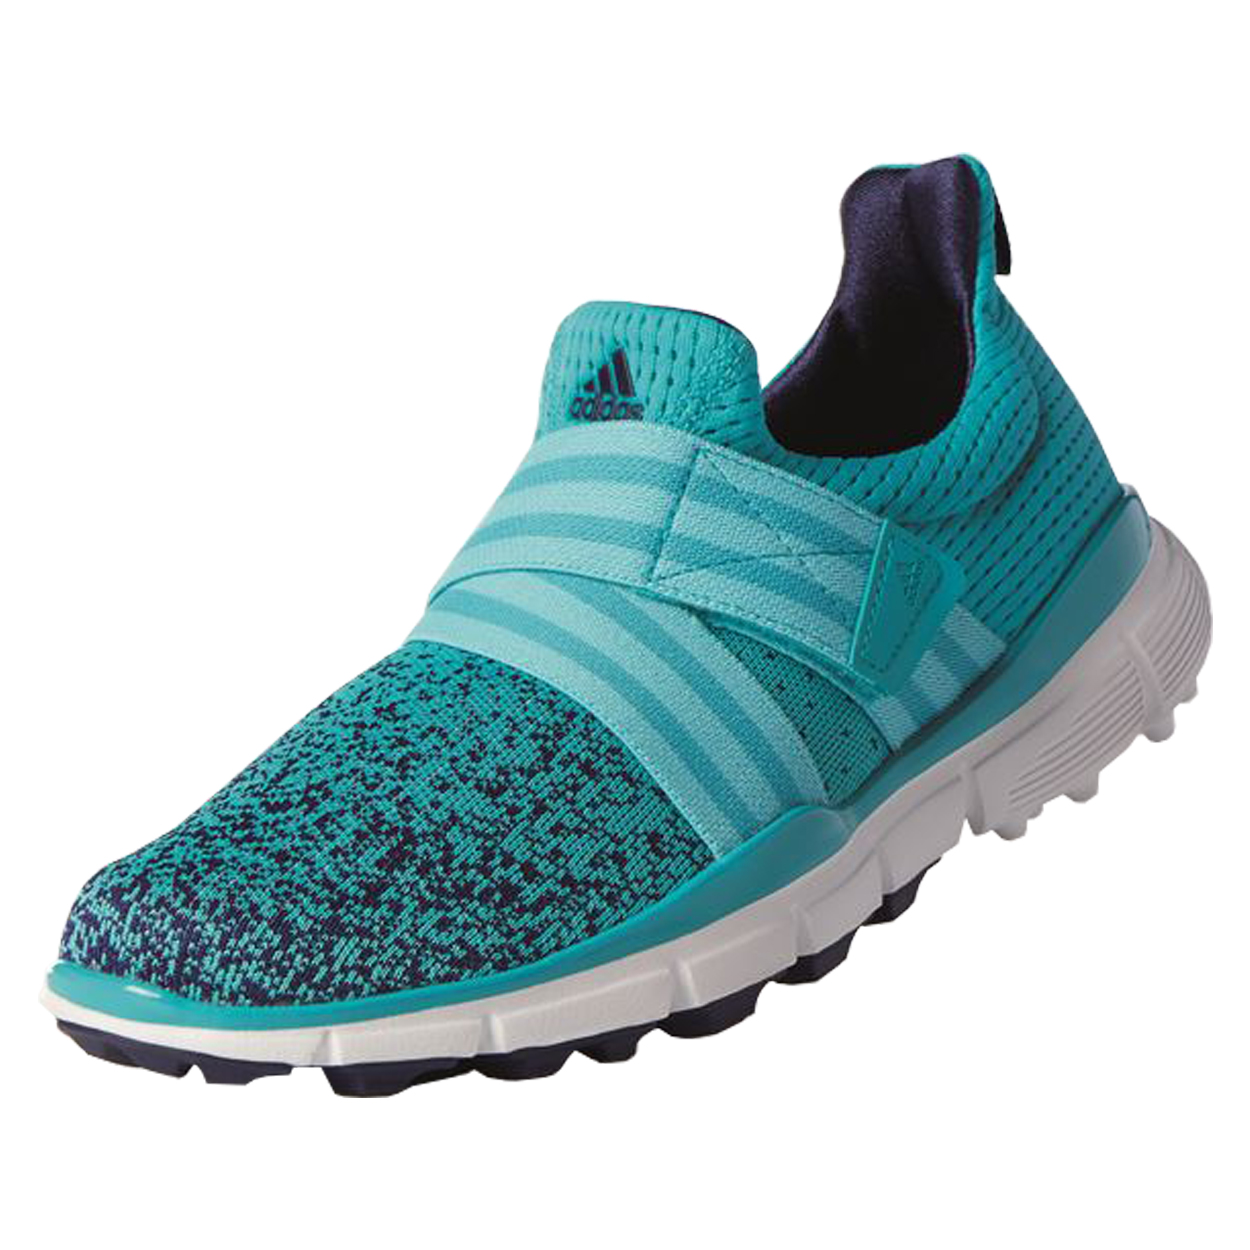 9a66f73cef3 Adidas ClimaCool Knit Women s Golf Shoe - GolfEtail.com